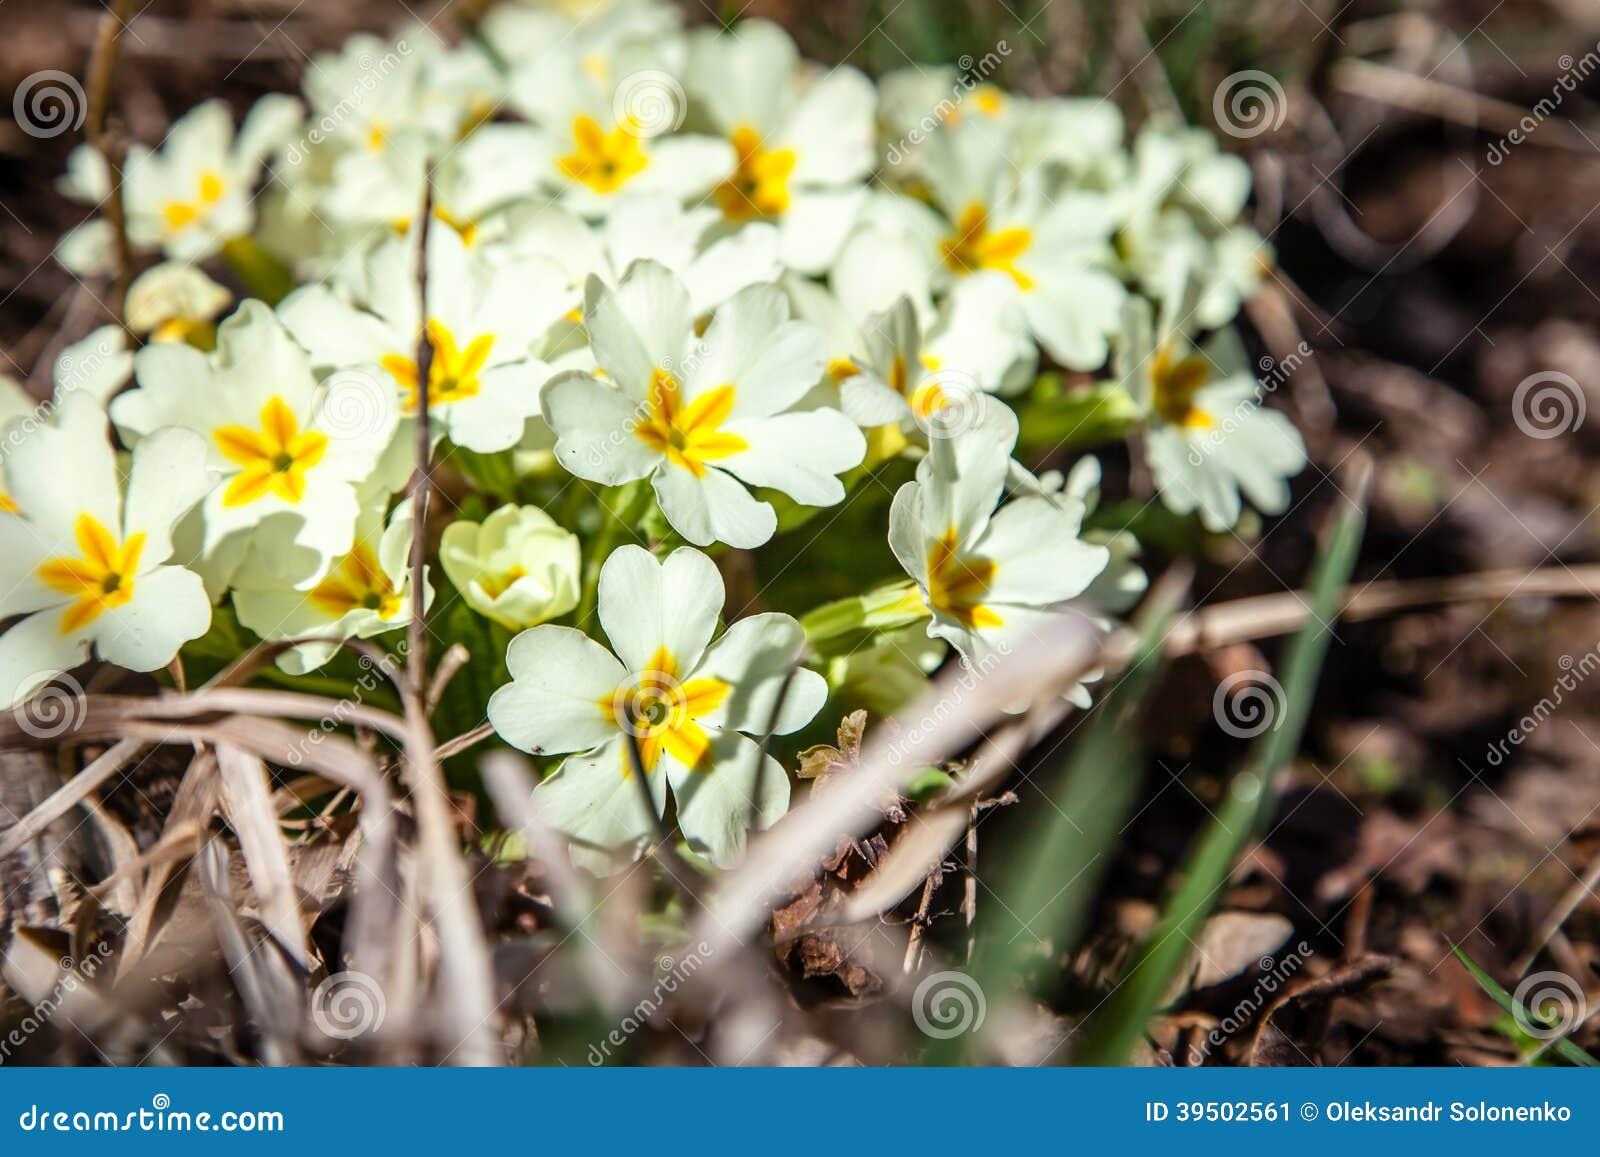 White Spiraea (Meadowsweet) flowers early spring